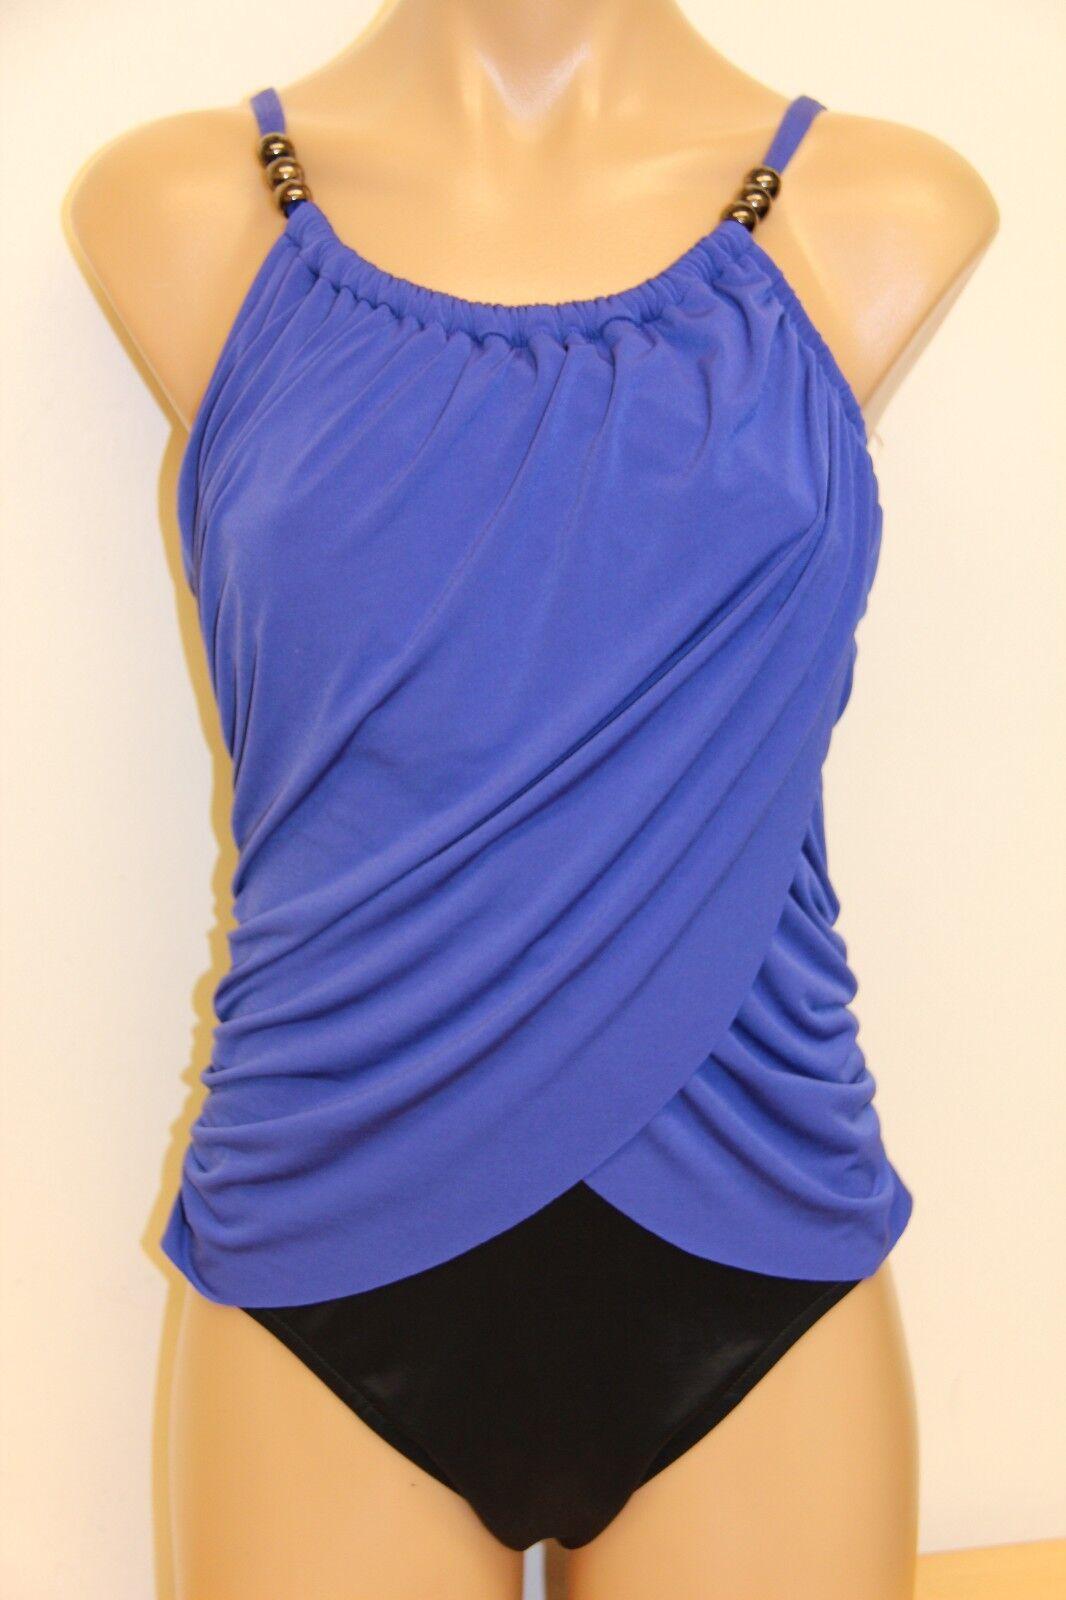 d979dfdaf2 NWT Magic Suit by Miraclesuit 1 one piece bluee Swimsuit twilight  npqdot2814-Swimwear